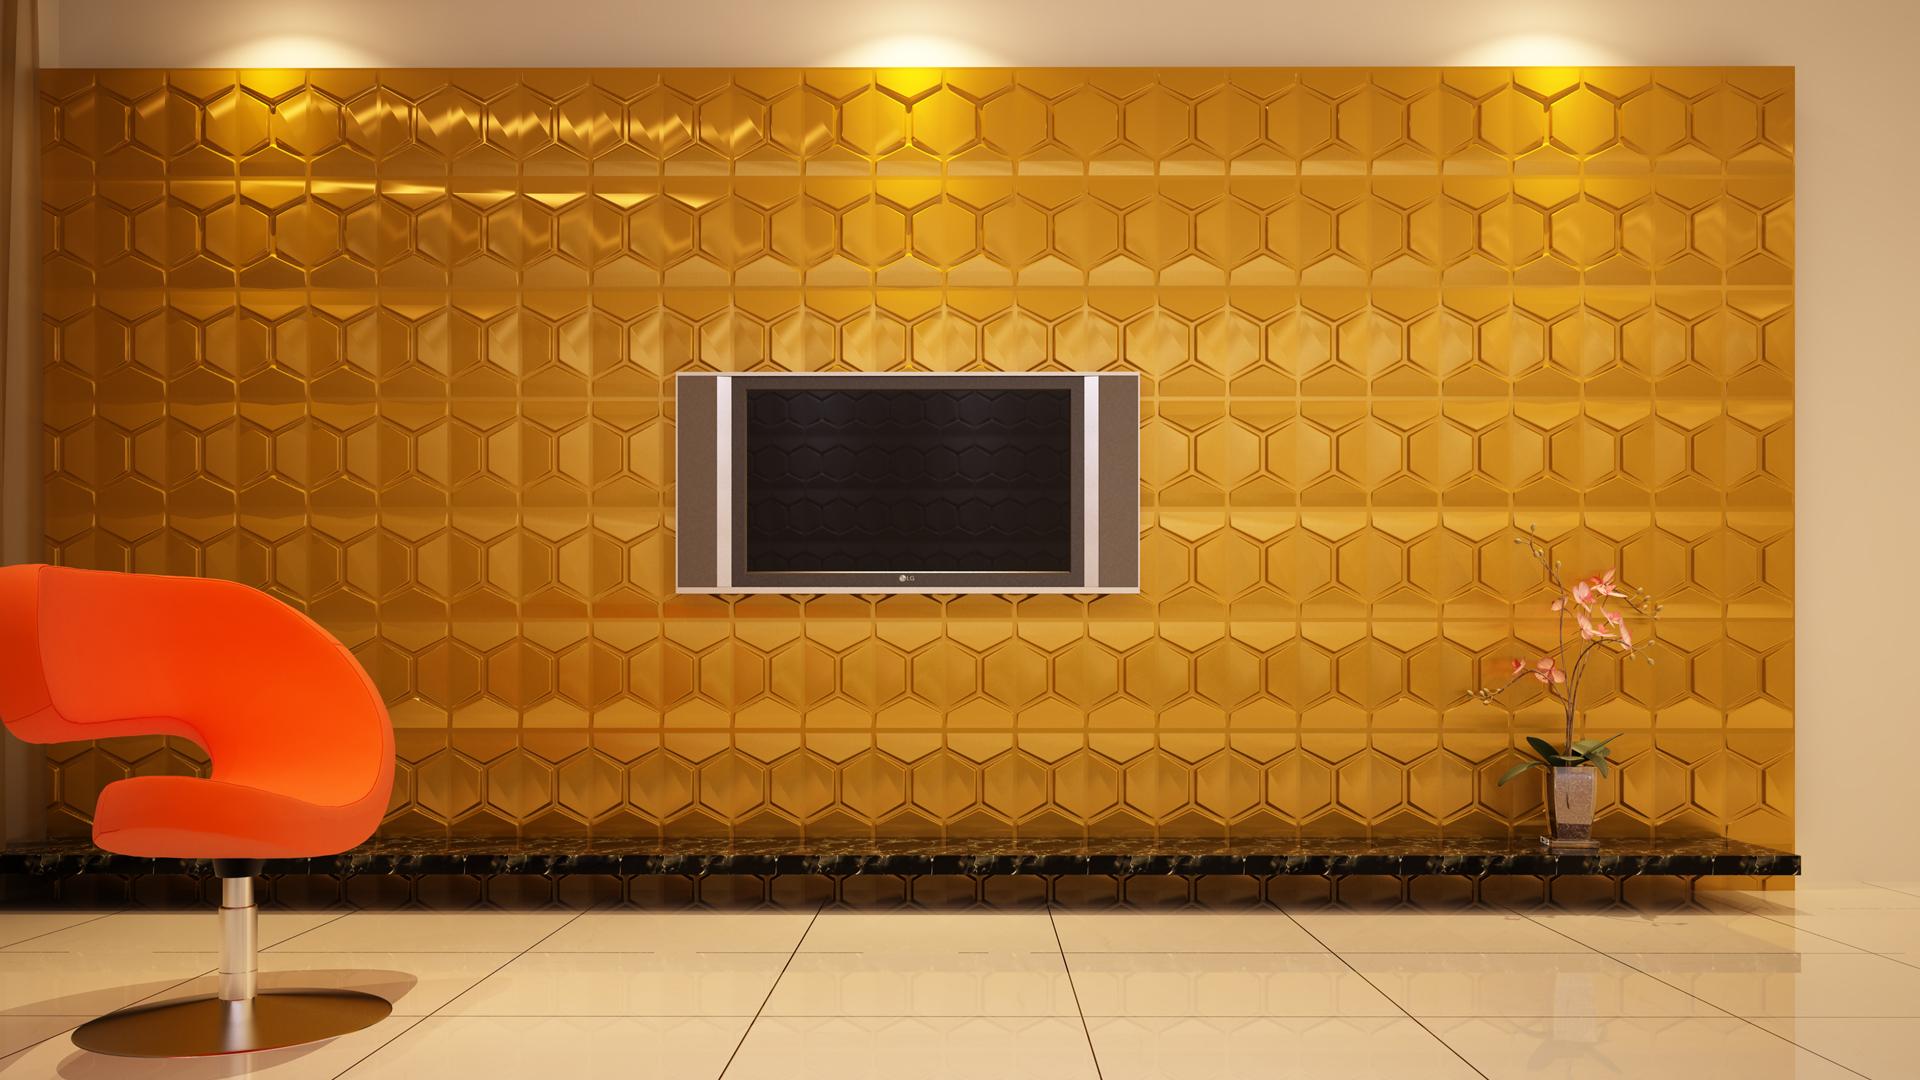 3D Wandpaneele - Produkte - Comb - Deckenpaneele - 3D Tapeten - Wandverkleidung